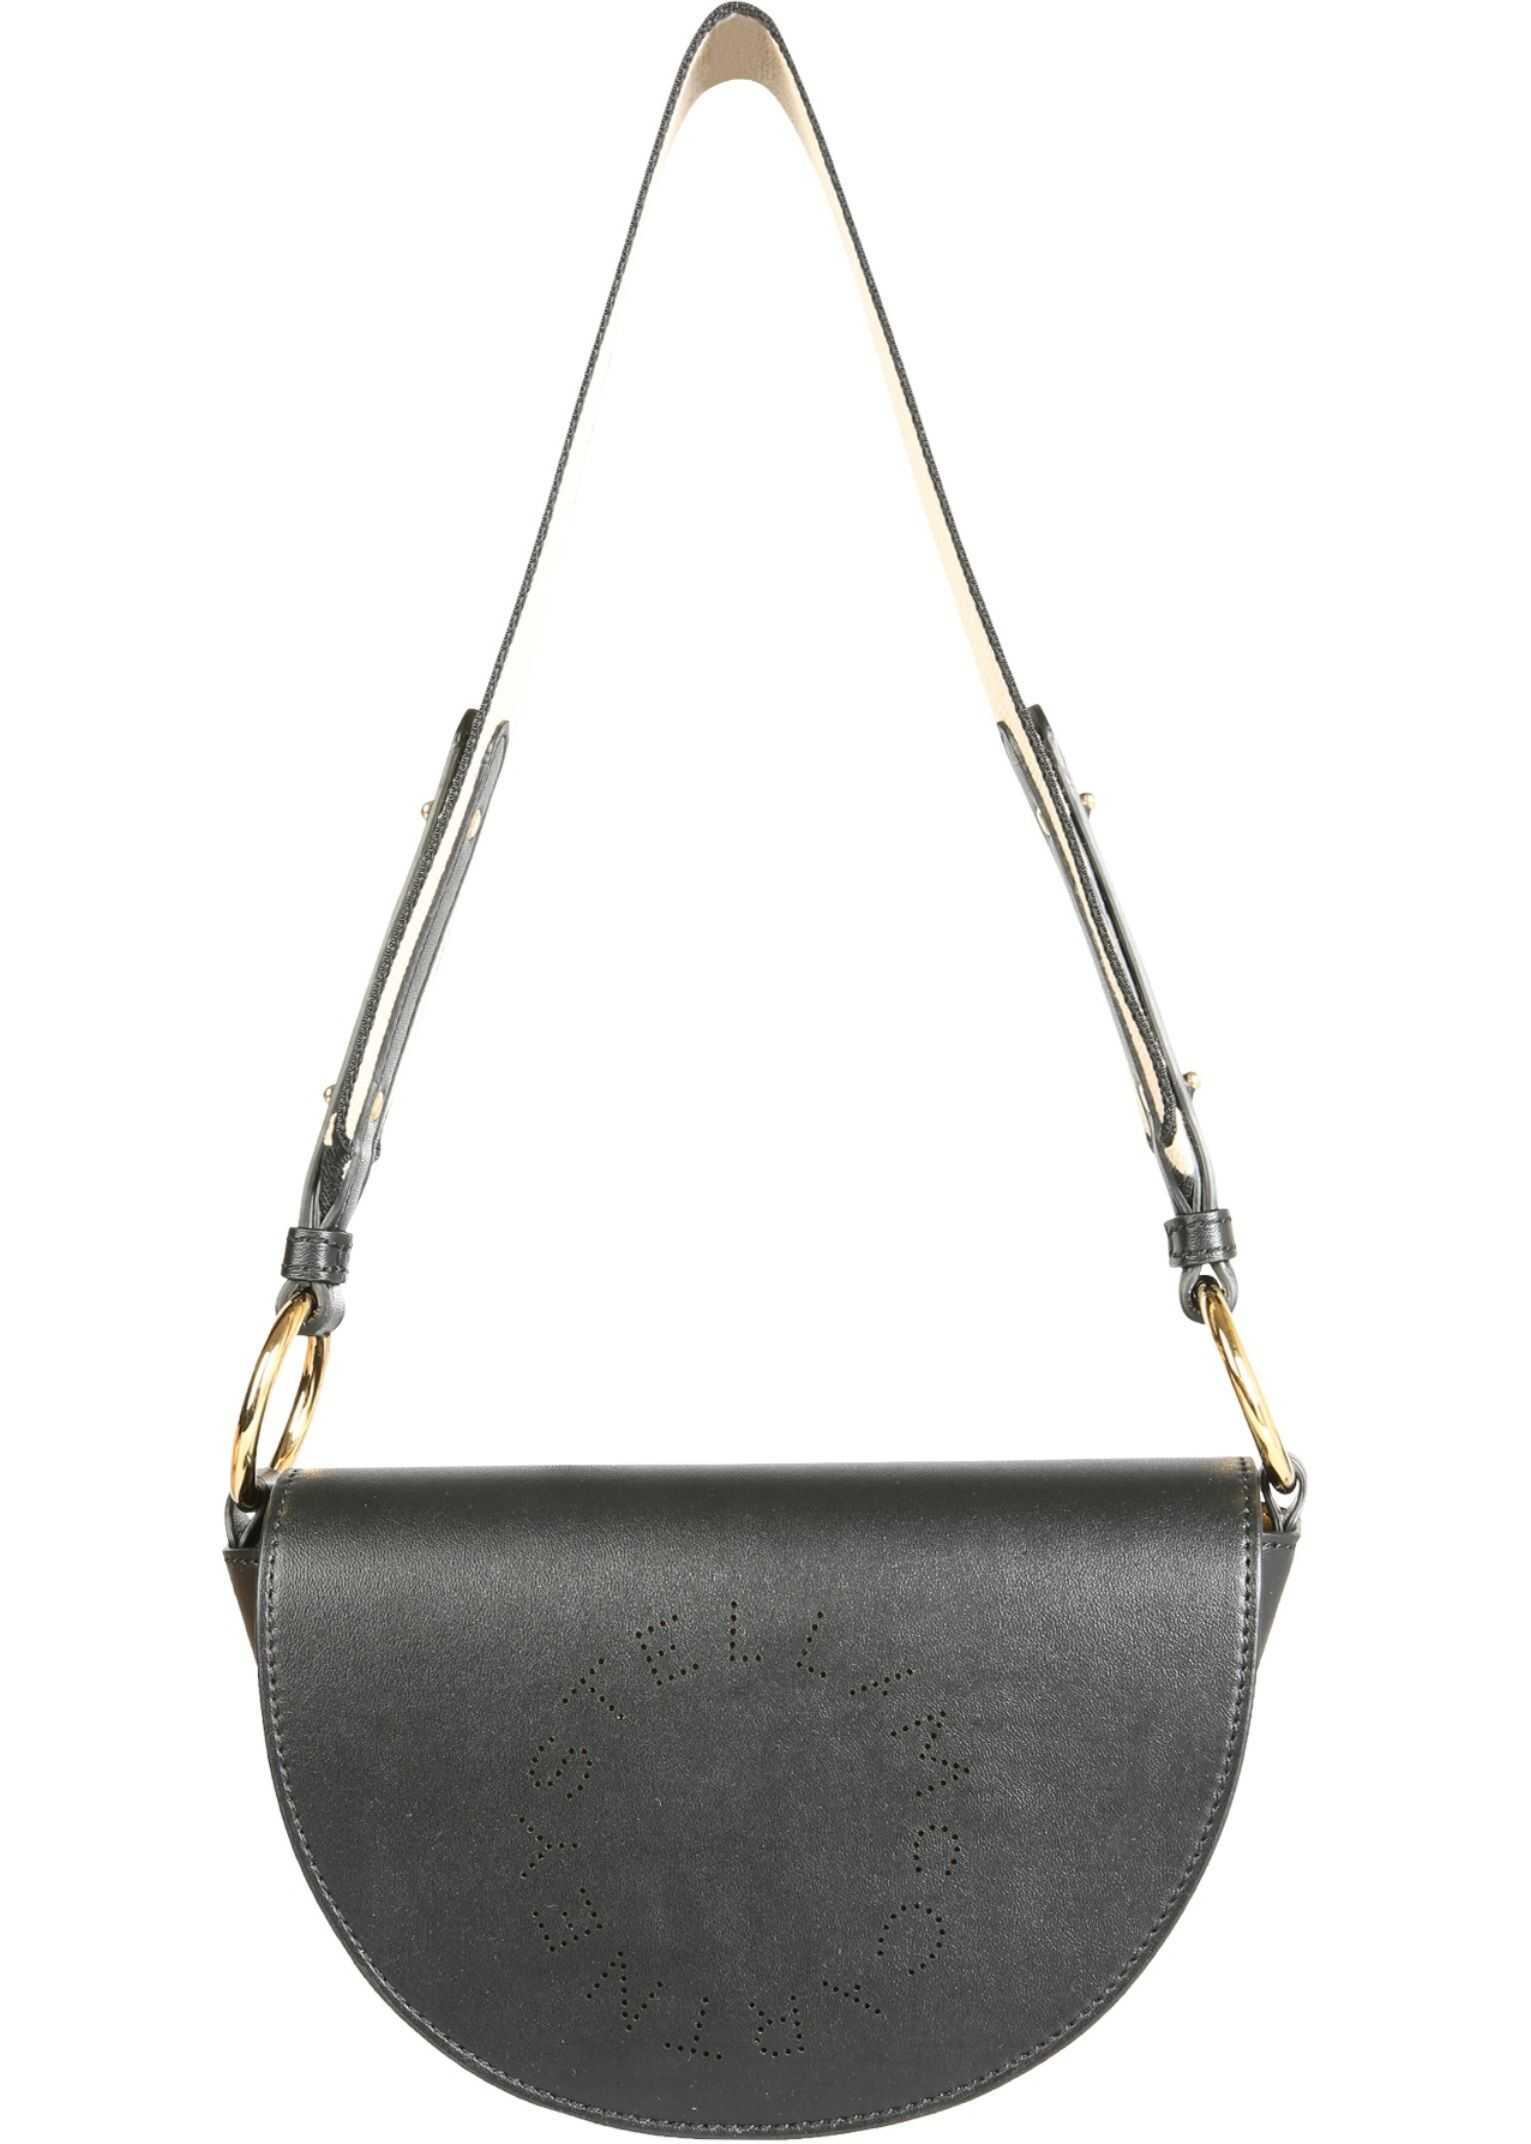 Stella McCartney Mini Marlee Bag 700083_W85421000 BLACK imagine b-mall.ro